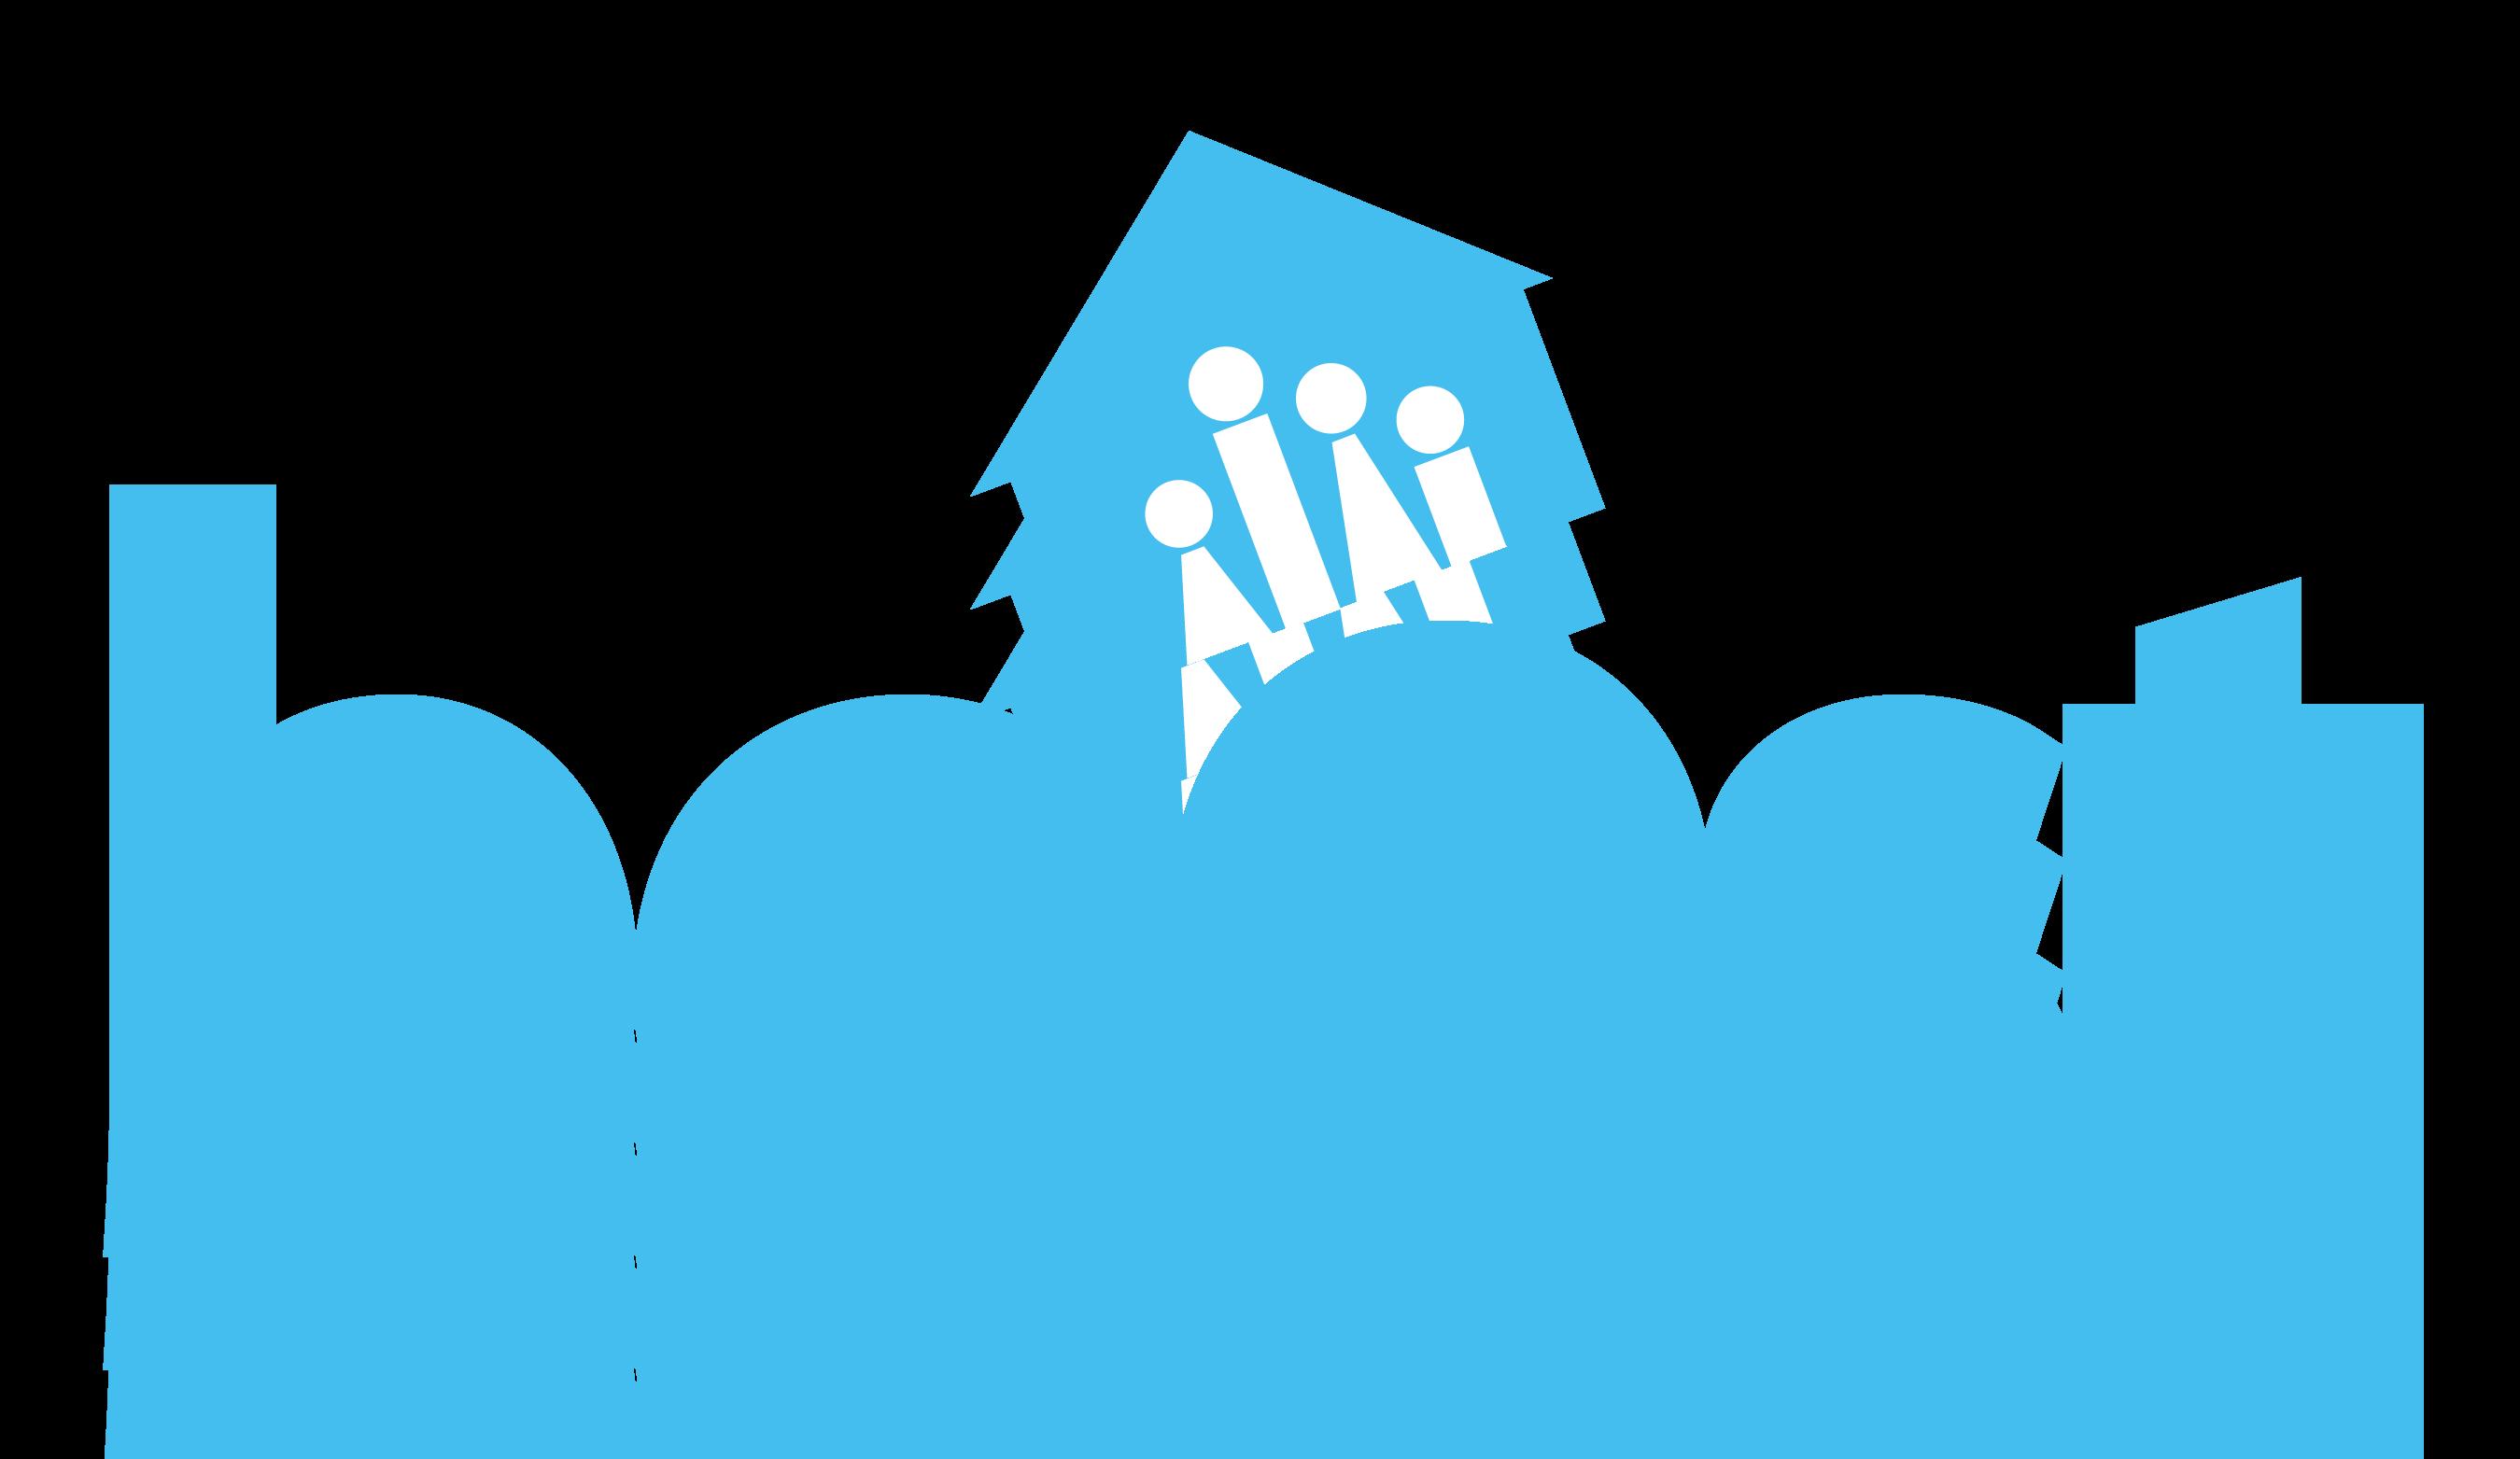 Image: lift disability network boost program logo. Color: blue